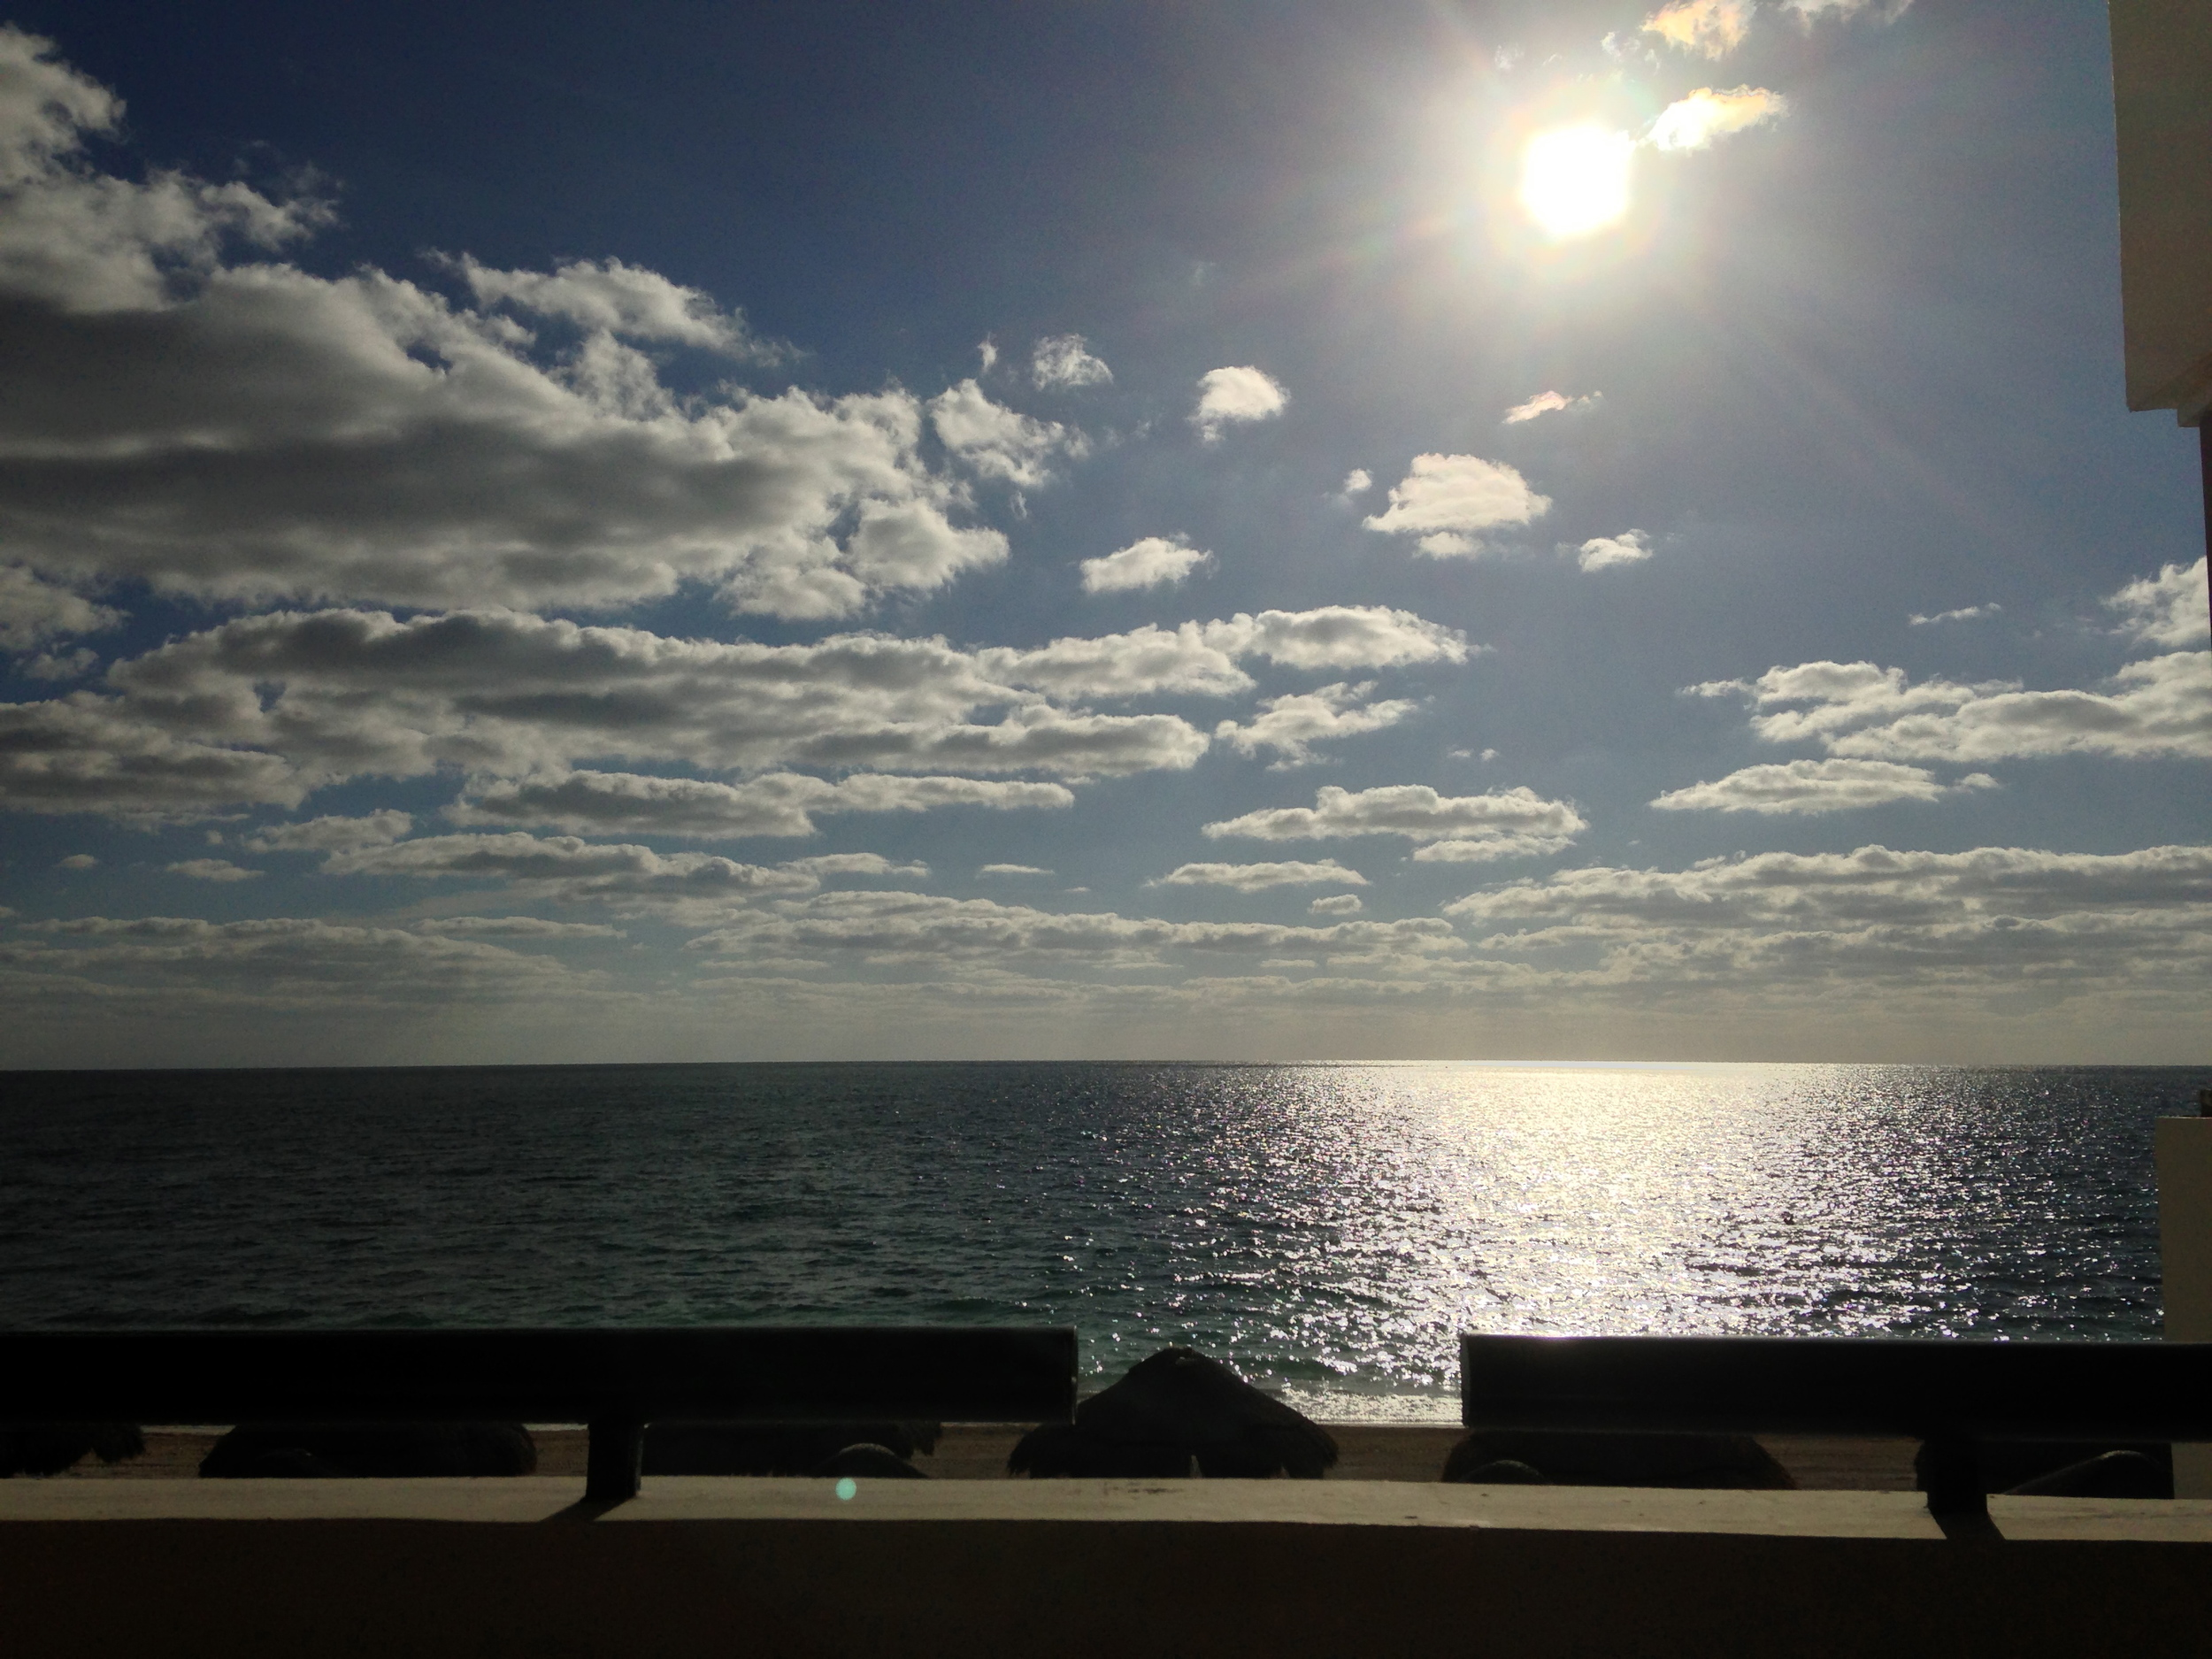 Just a gratuitous picture of Cancun Paradise